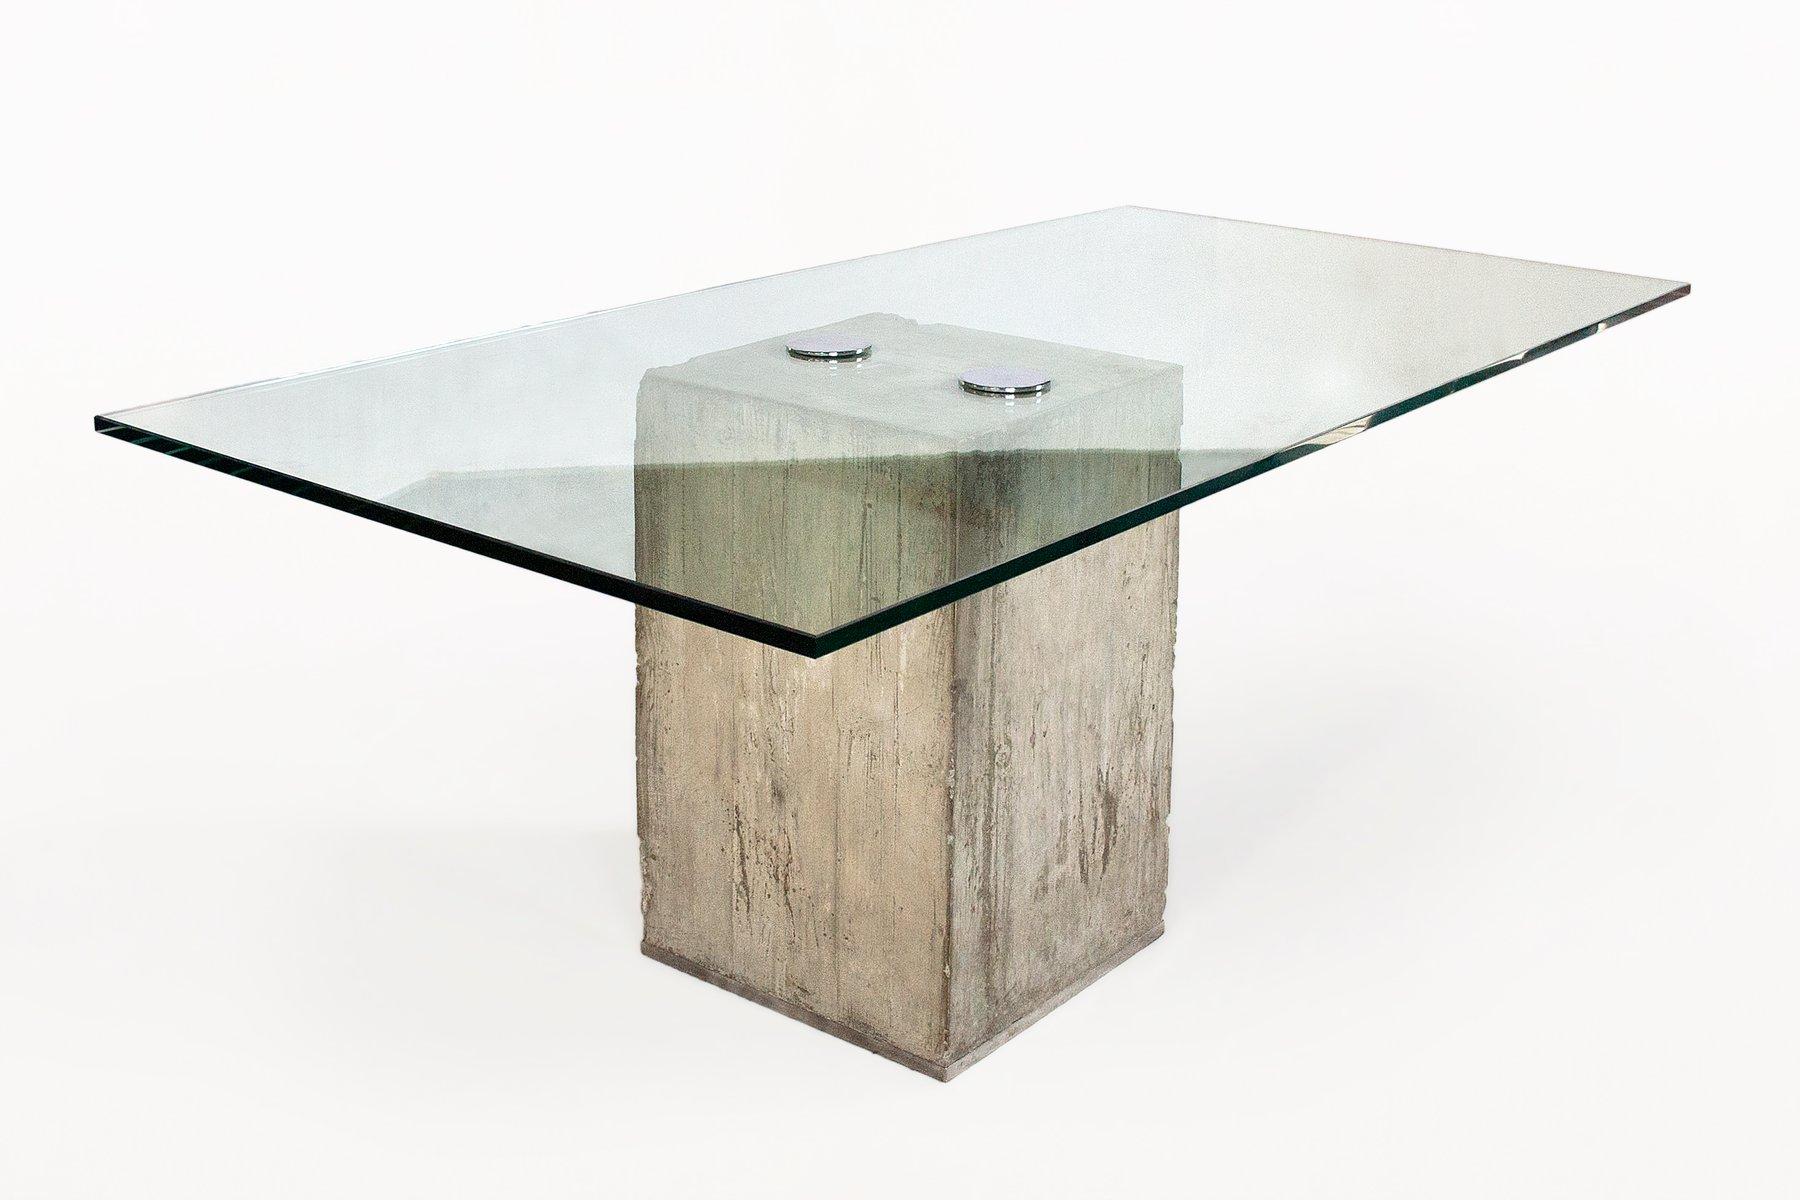 Glass and Concrete Dining Table by Sergio & Giorgio Sporiti 1970s